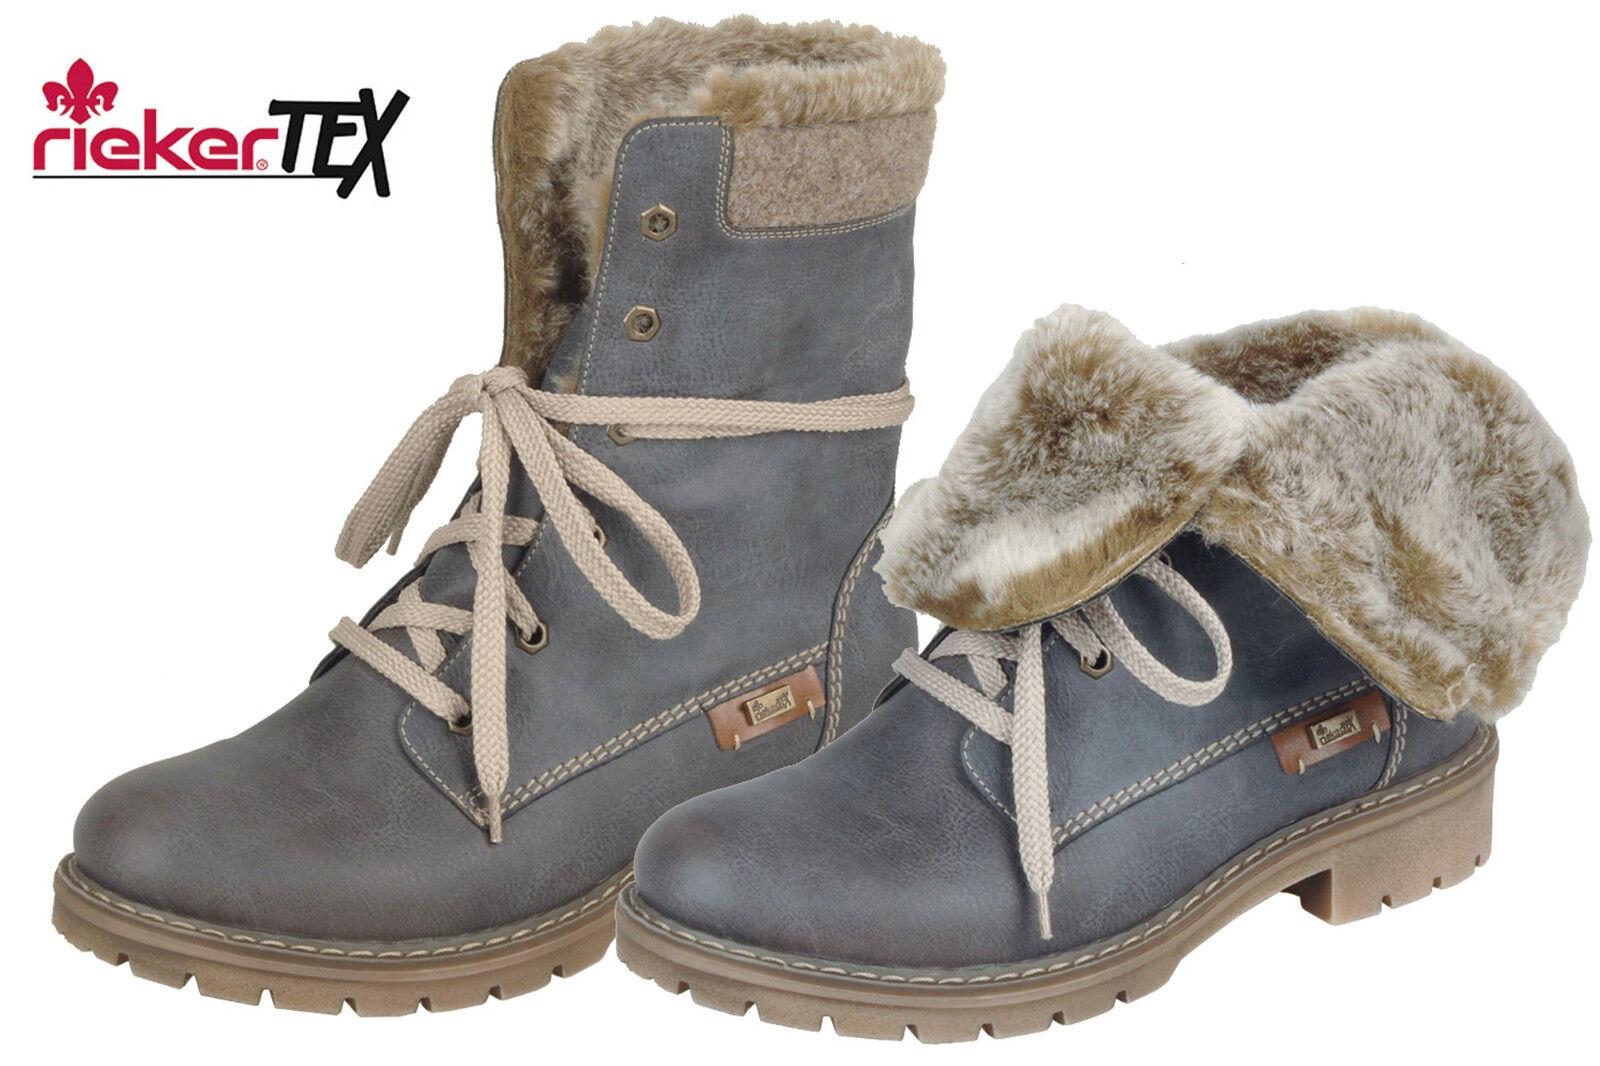 Rieker Tex Damen Stiefel Blau Grau Winter Stiefel Schuhe gefüttert Y9122-45 NEU